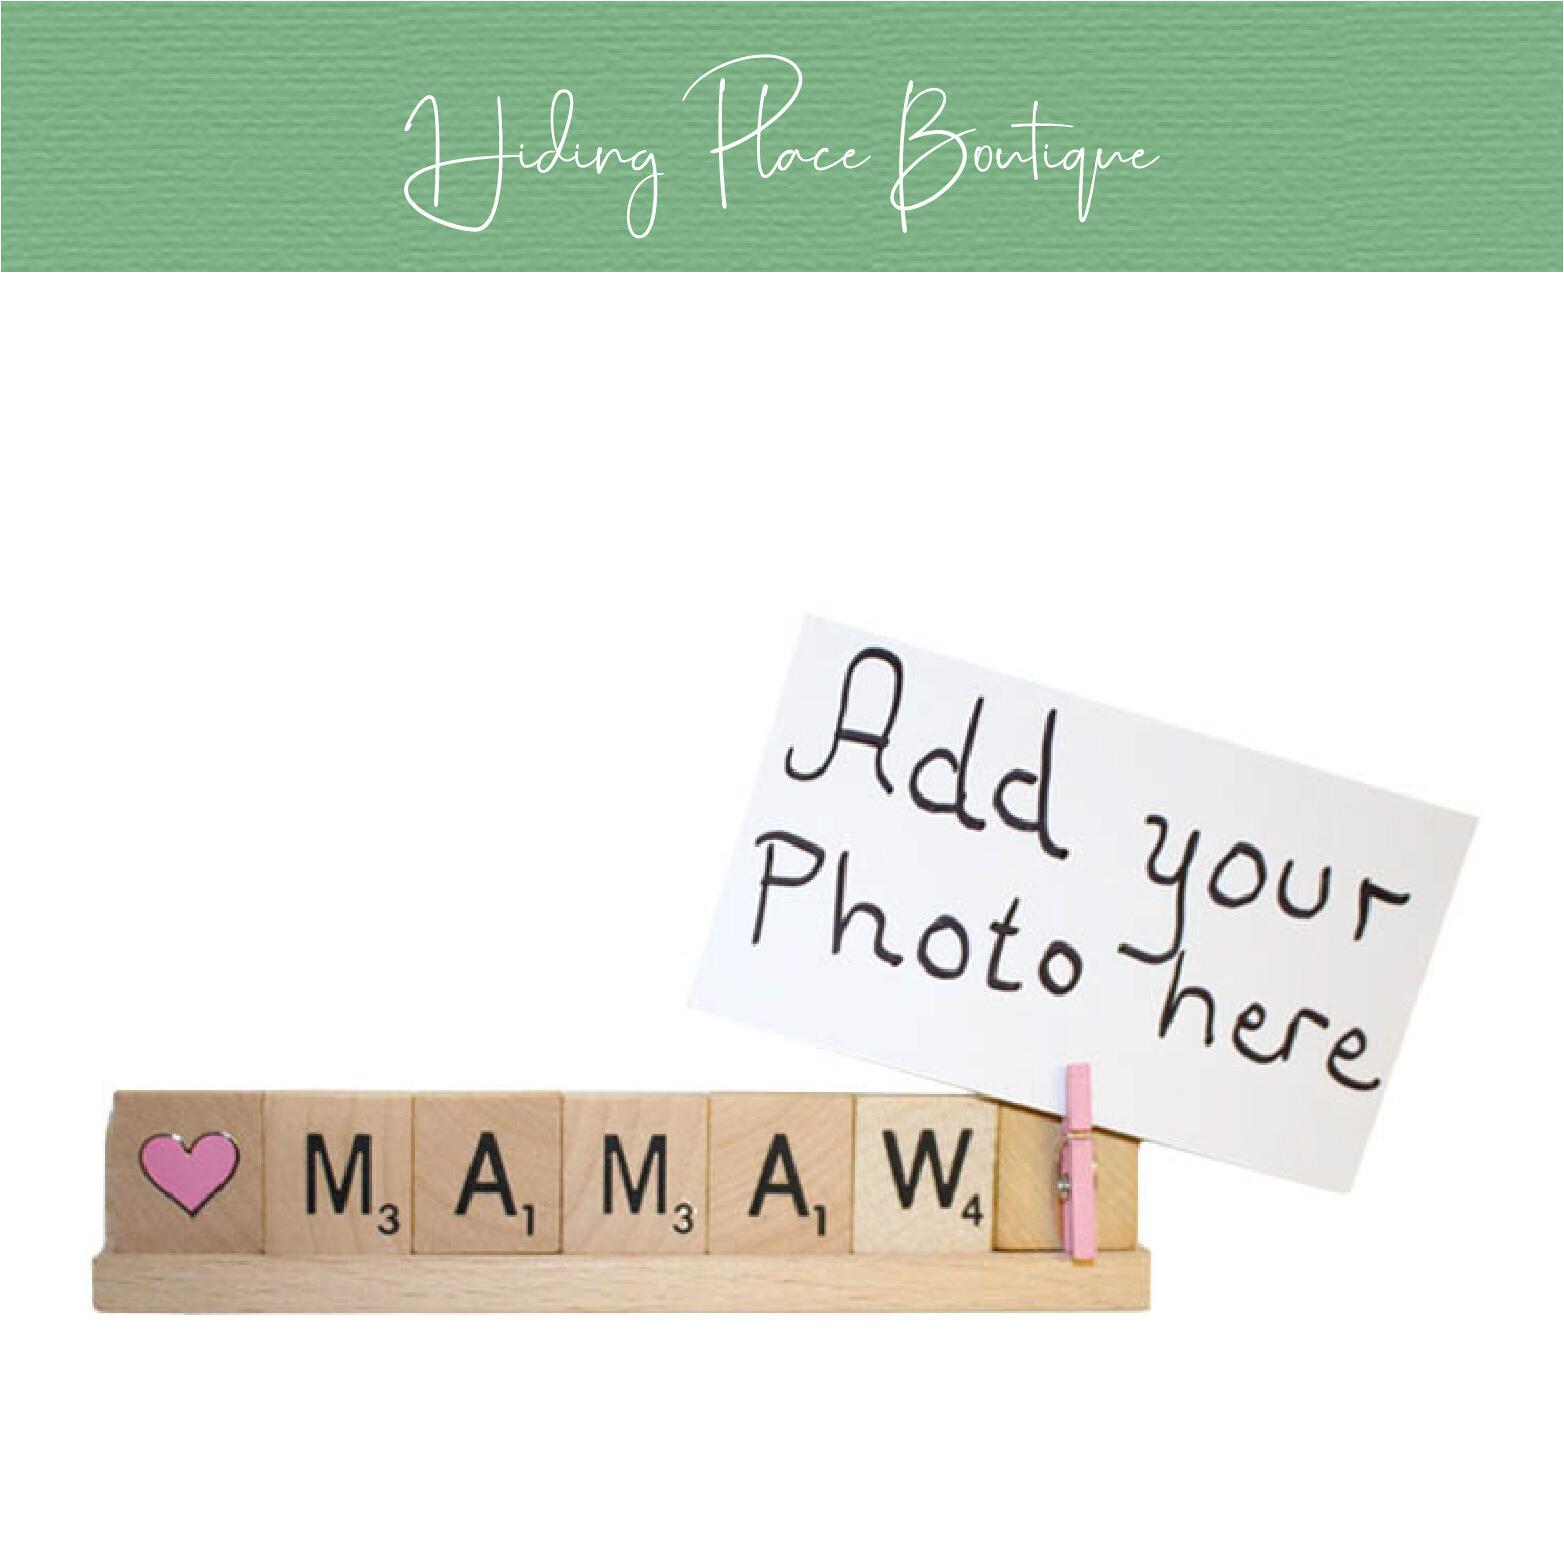 mamaw photo frame